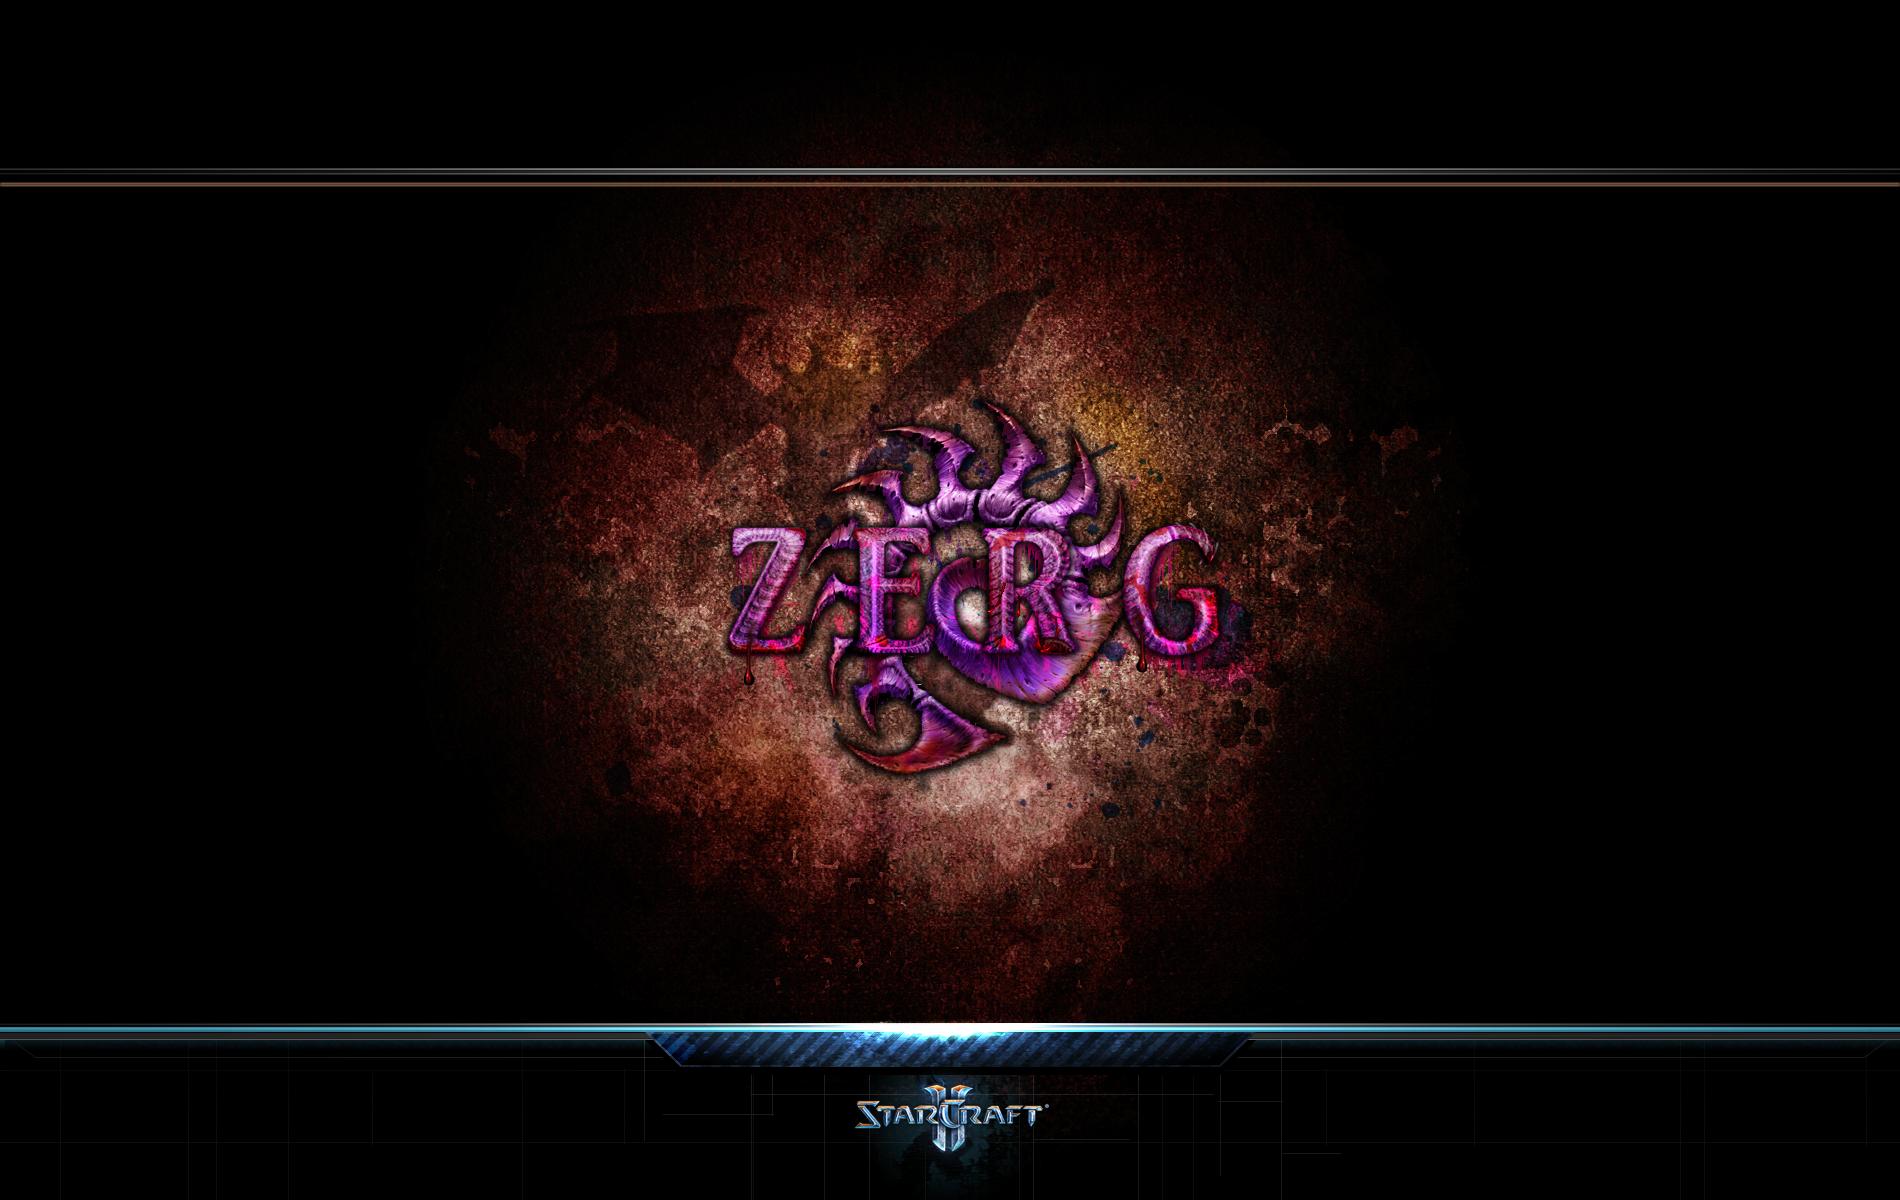 starcraft ii zerg wp by easydisplayname on deviantart